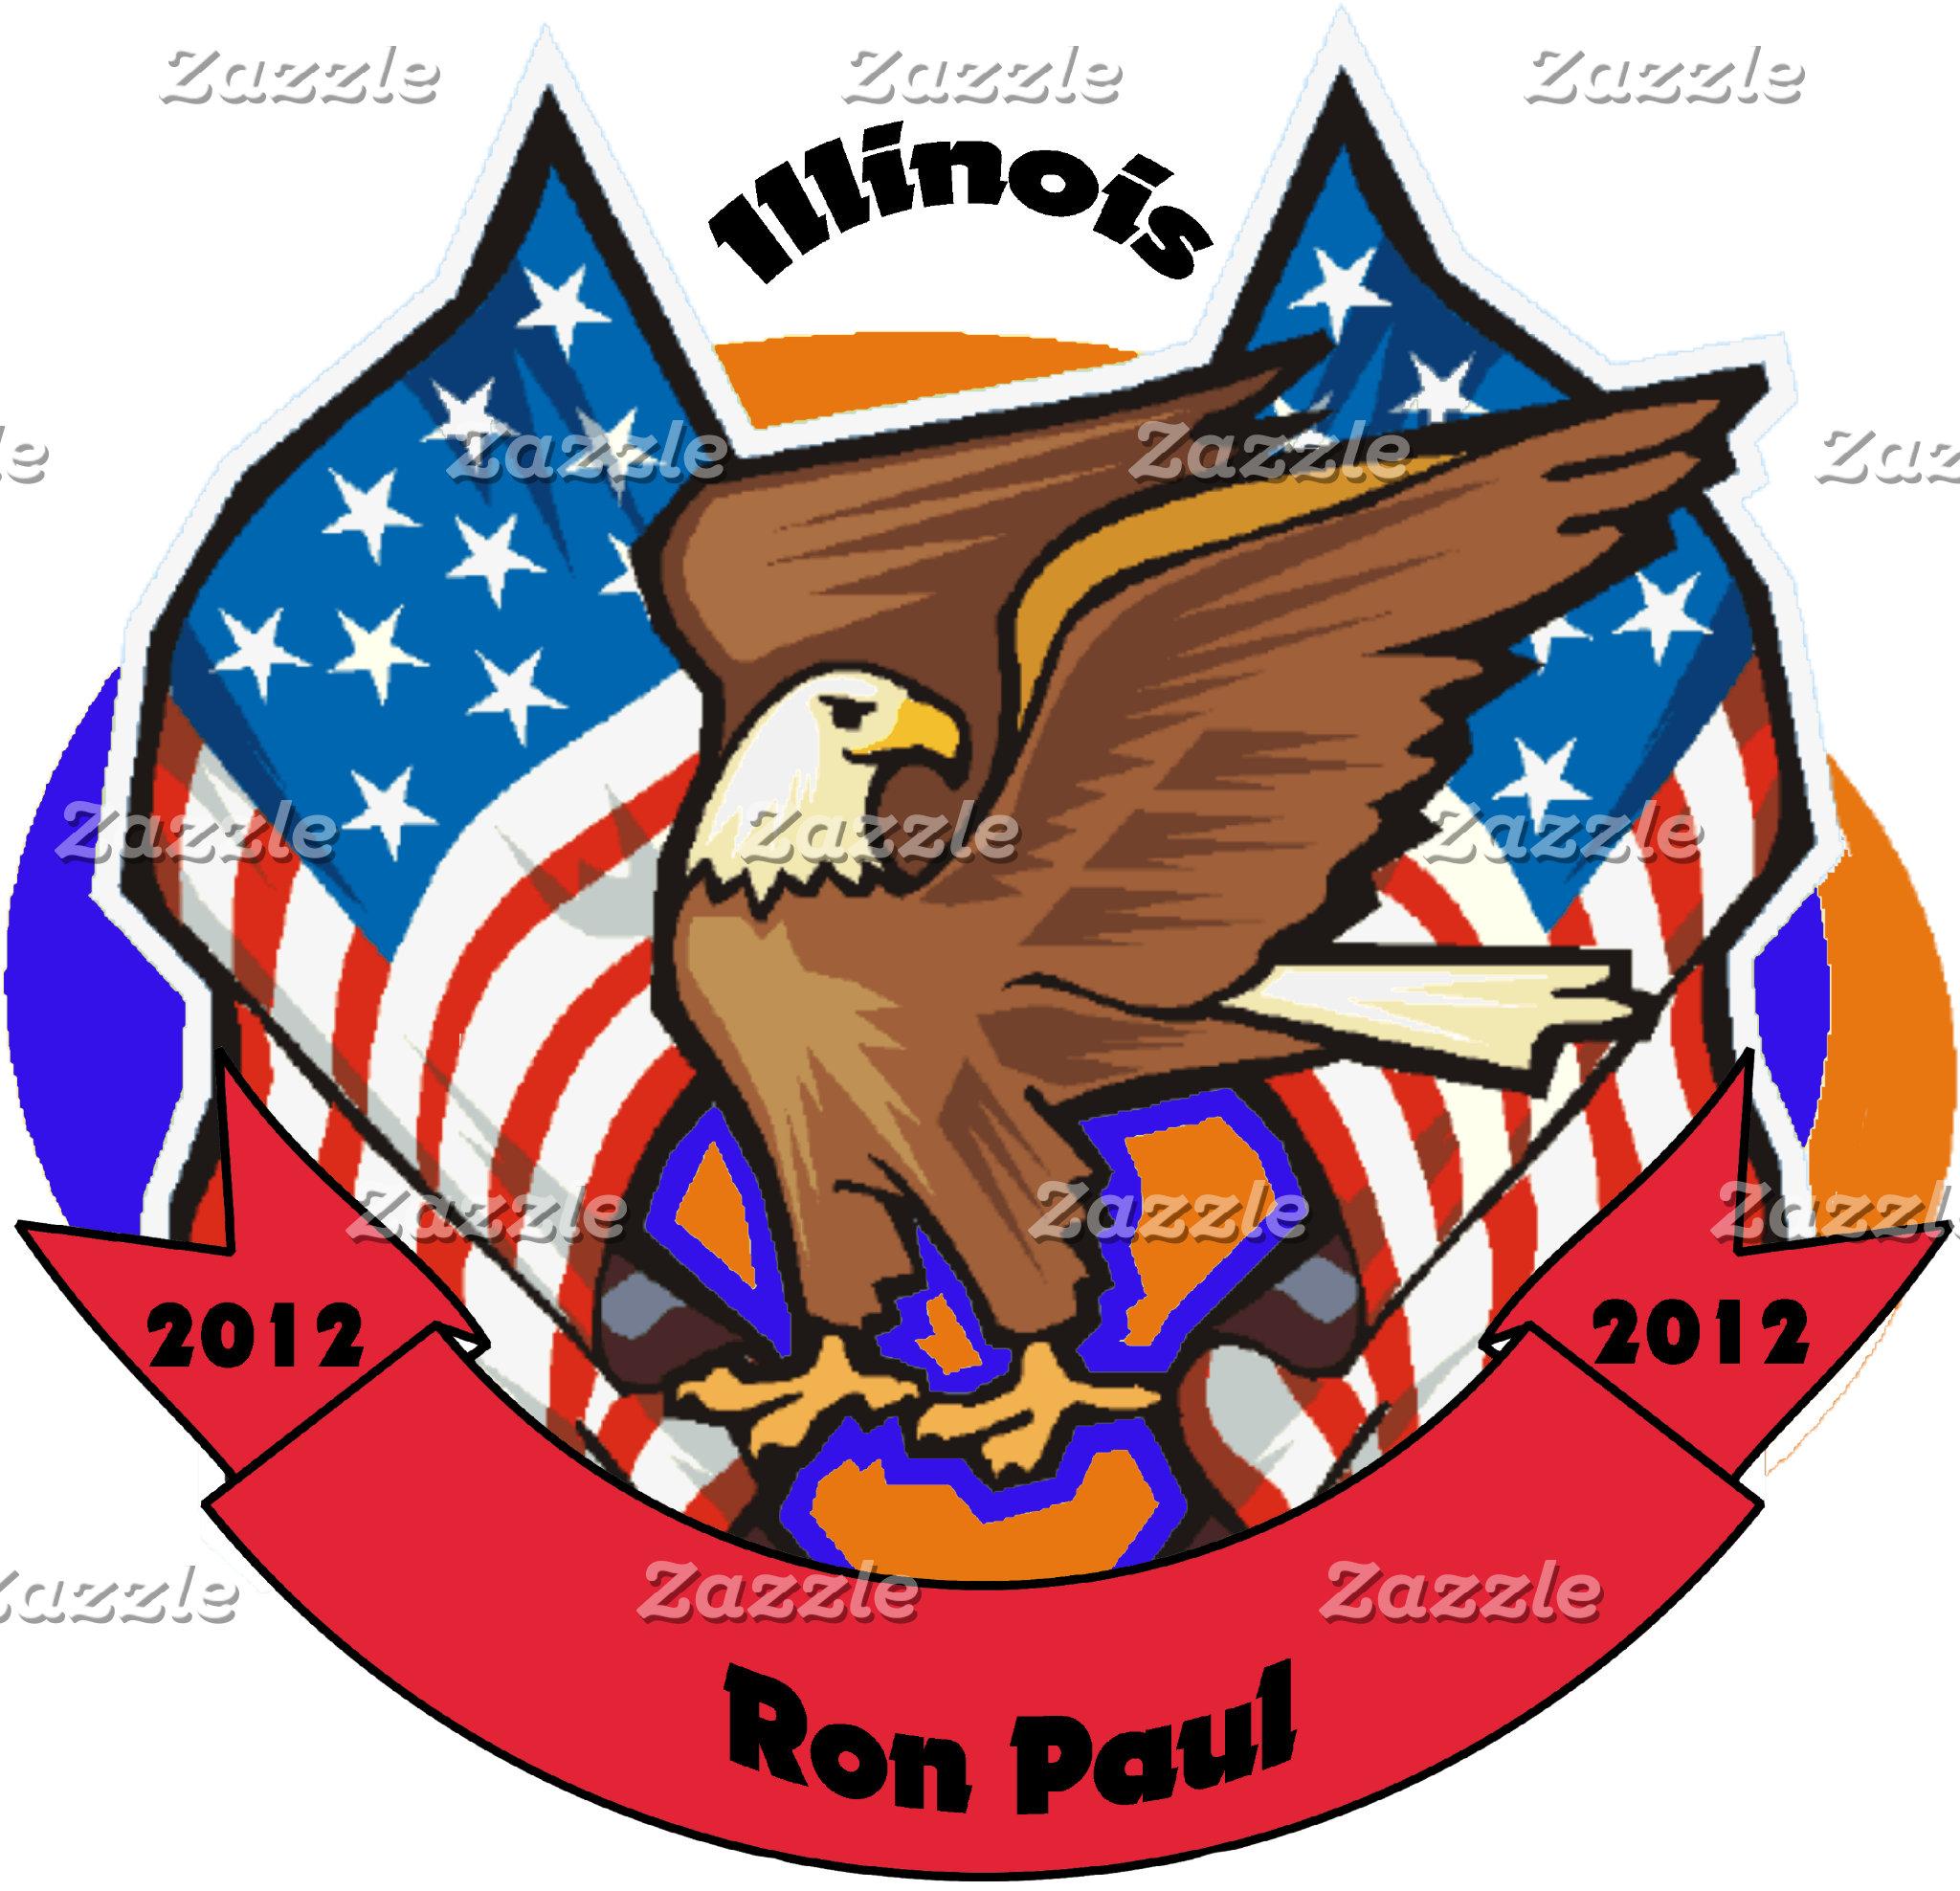 Illinois for Ron Paul